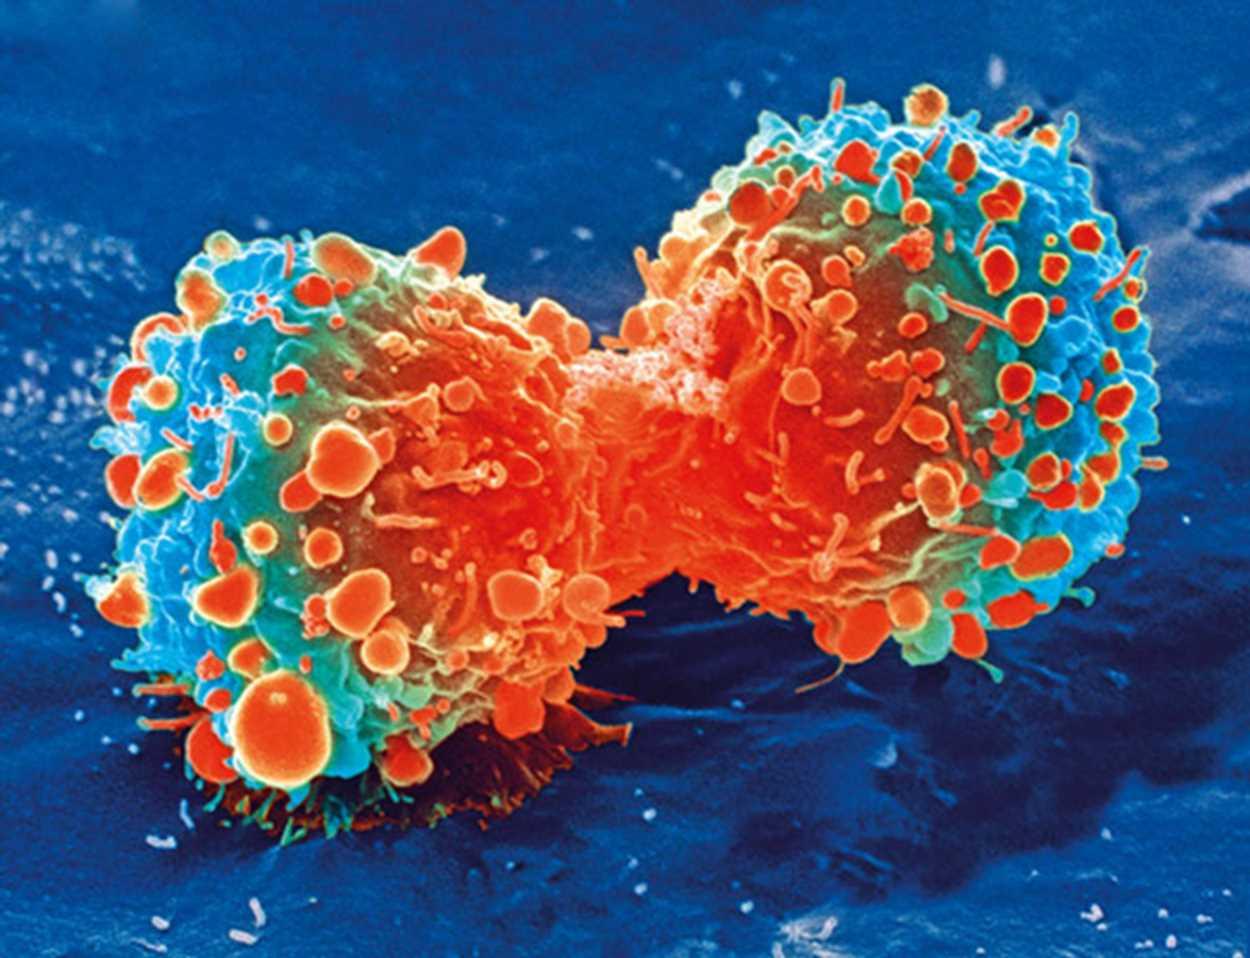 Survey finds physicians struggle to communicate positive thyroid cancer prognosis